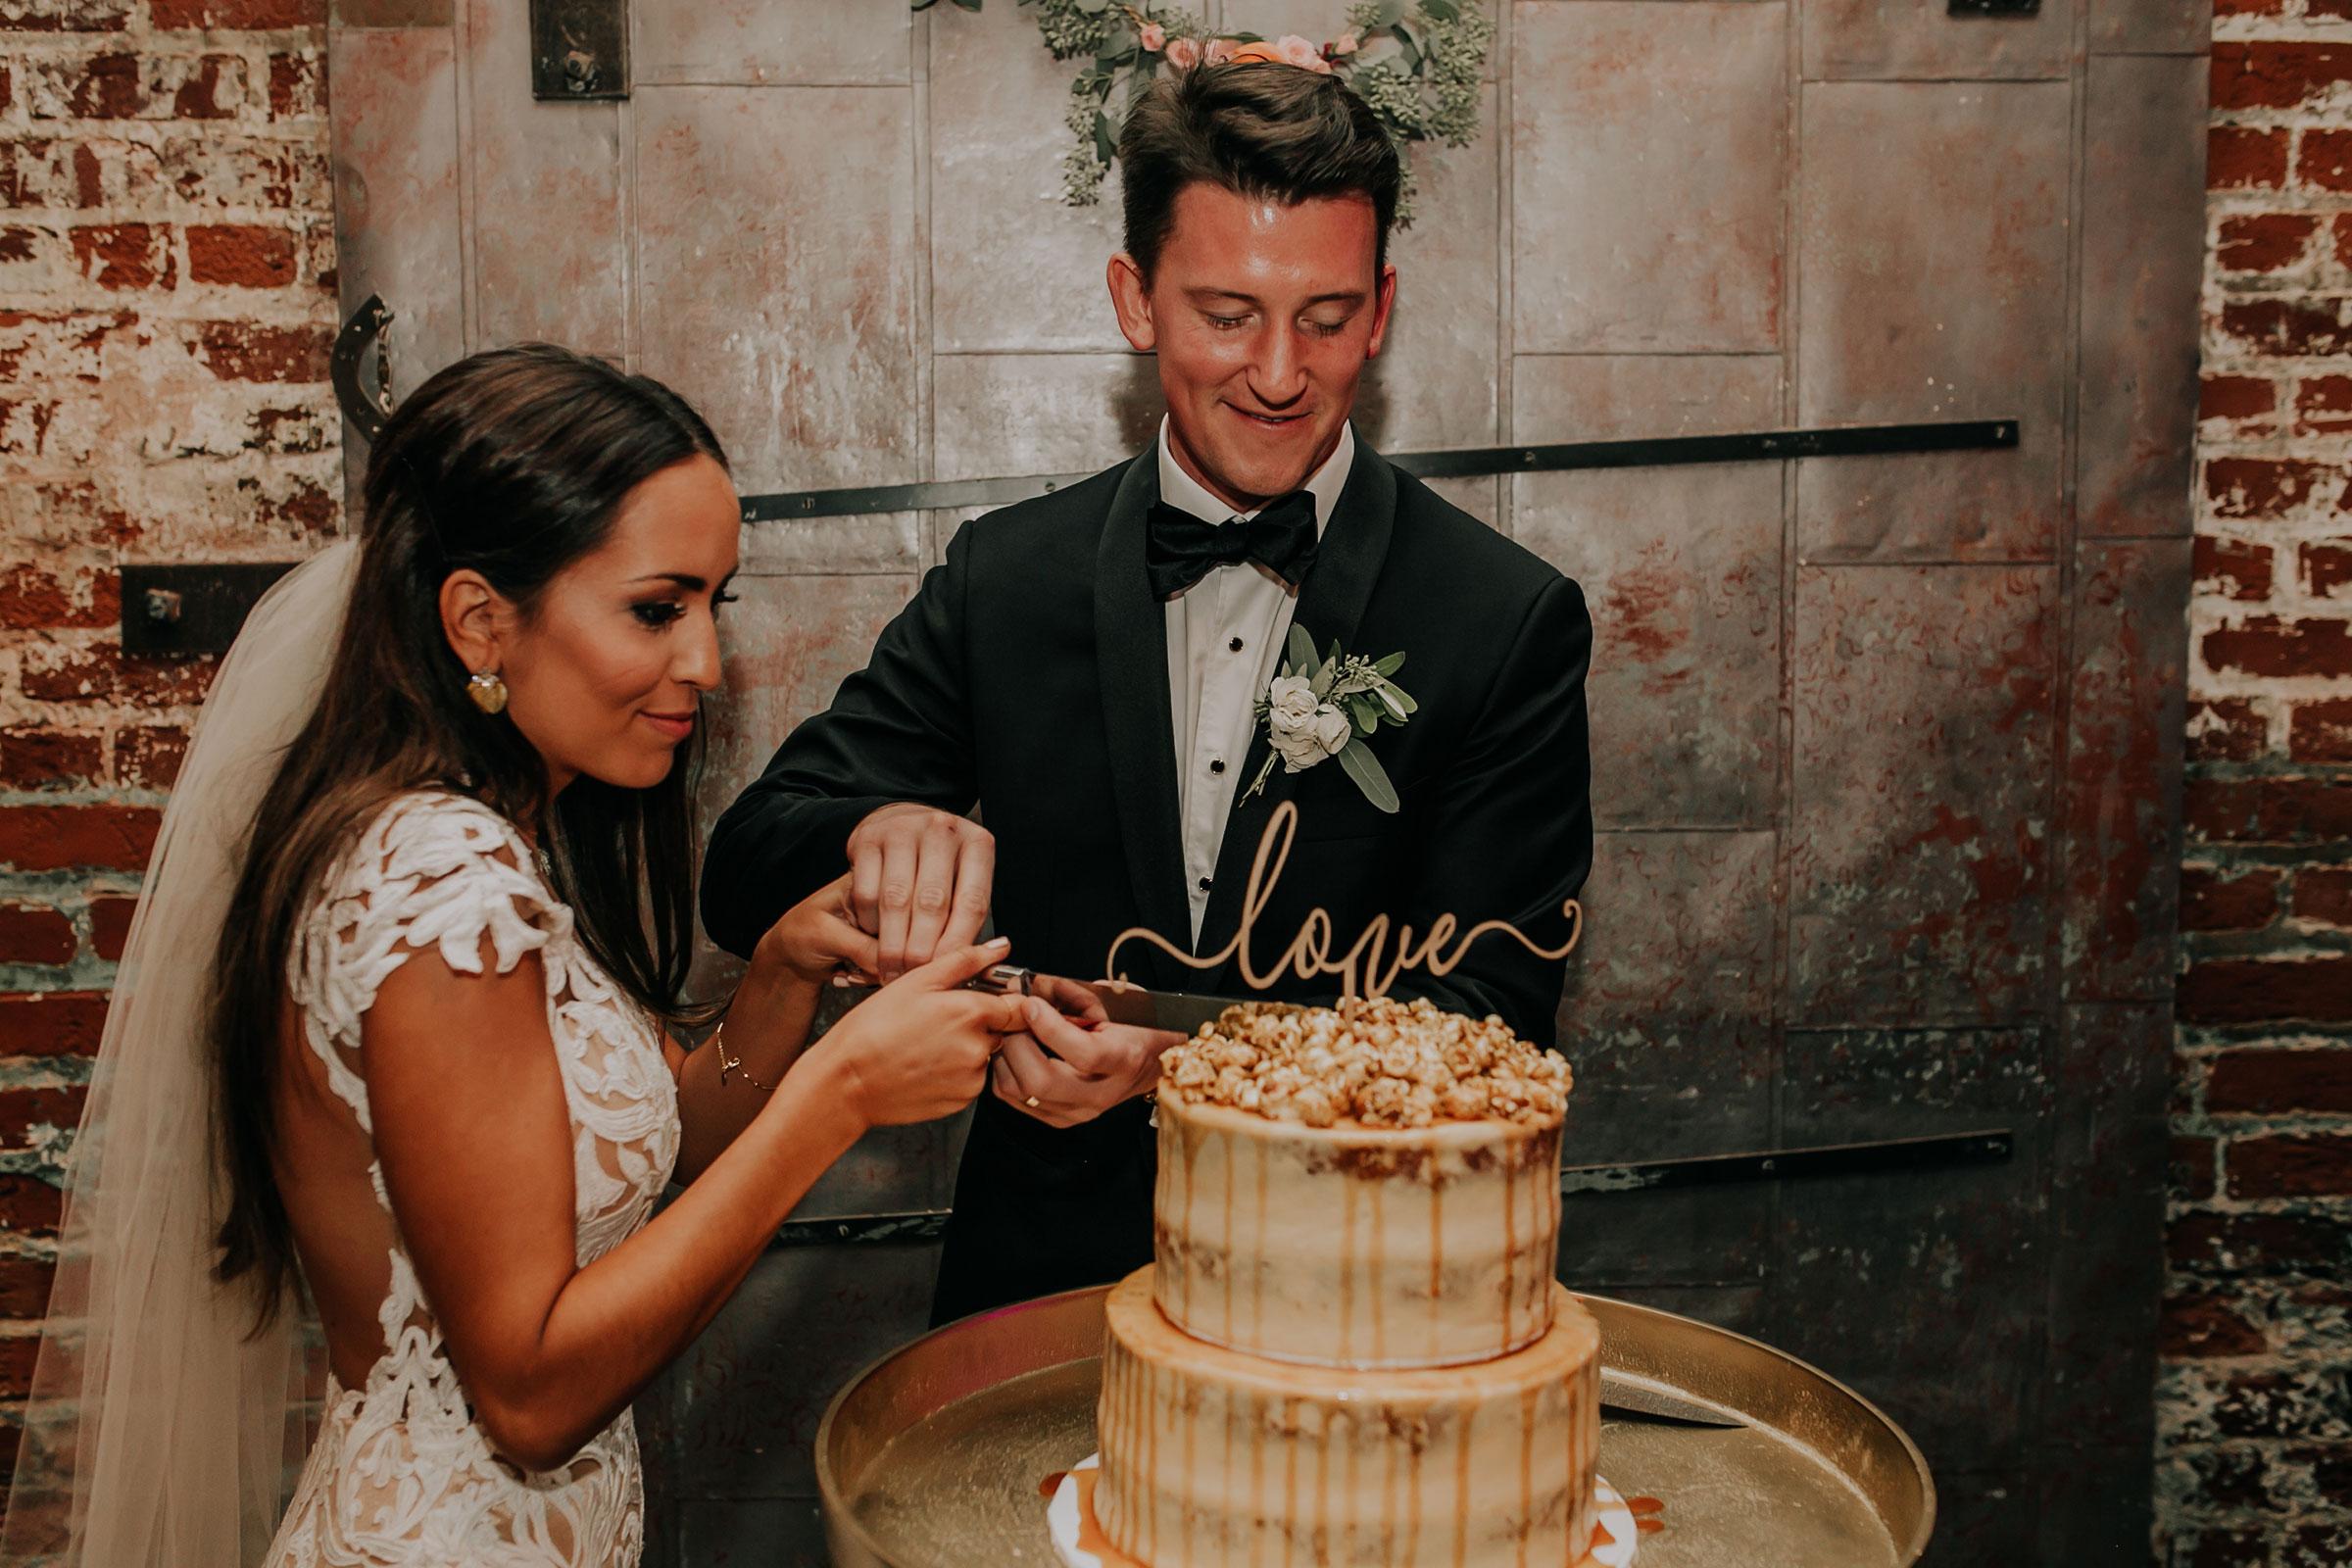 bride-groom-cutting-carmel-popcorn-cake-founders-one-nine-omaha-nebraska-raelyn-ramey-photography.jpg